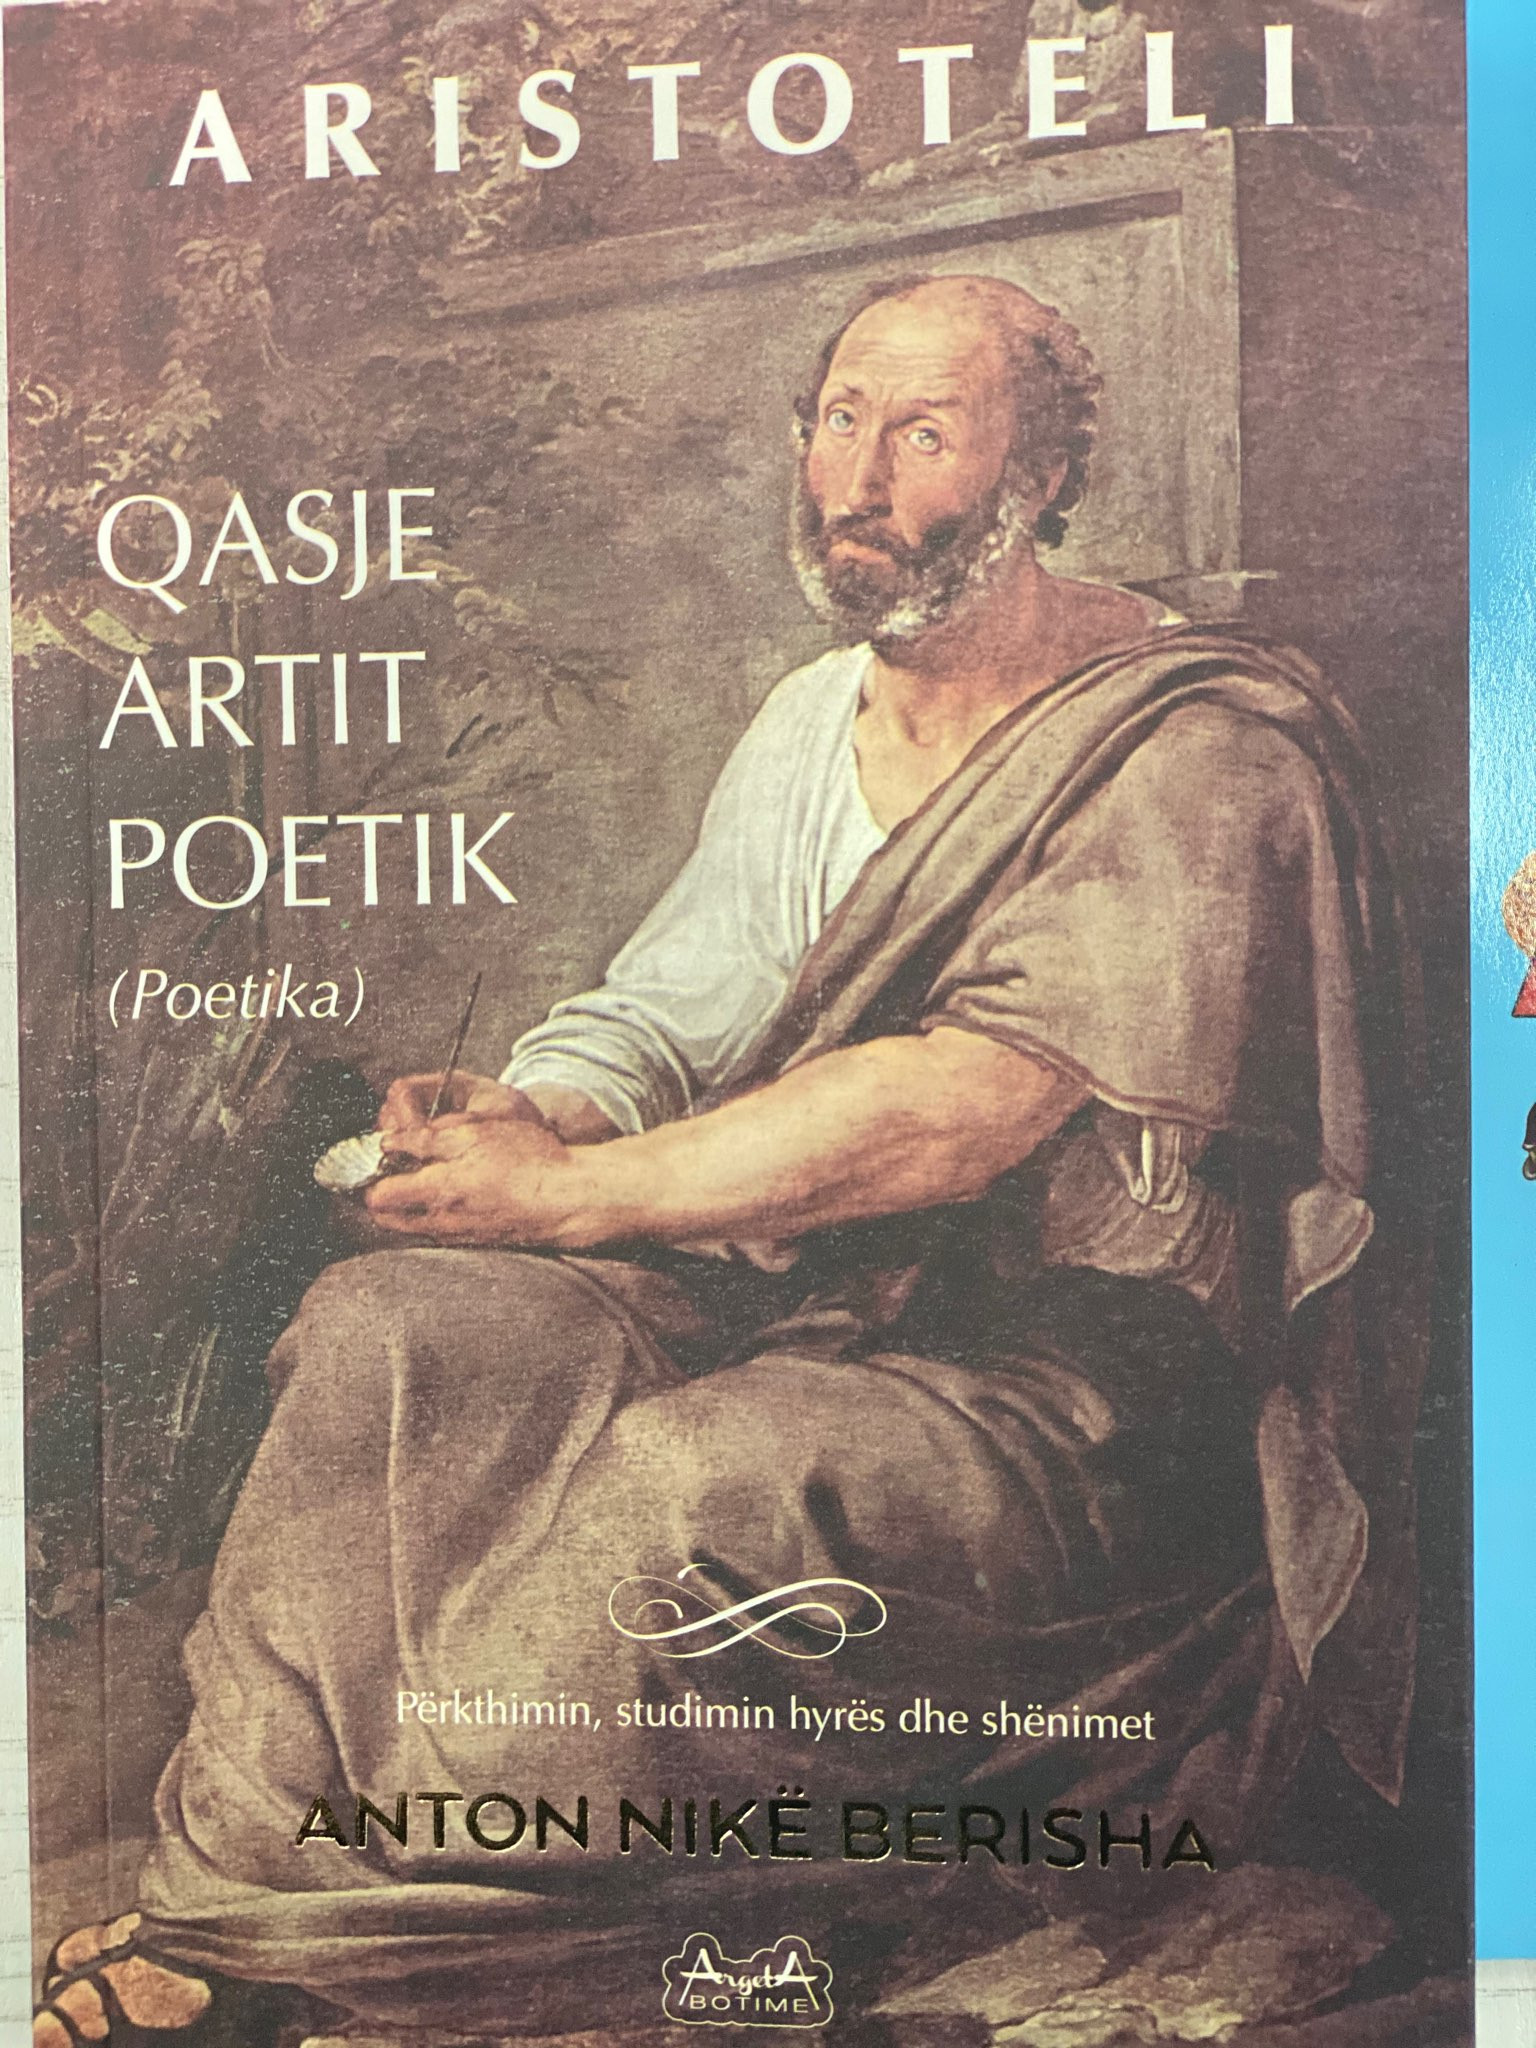 Qasje artit poetik